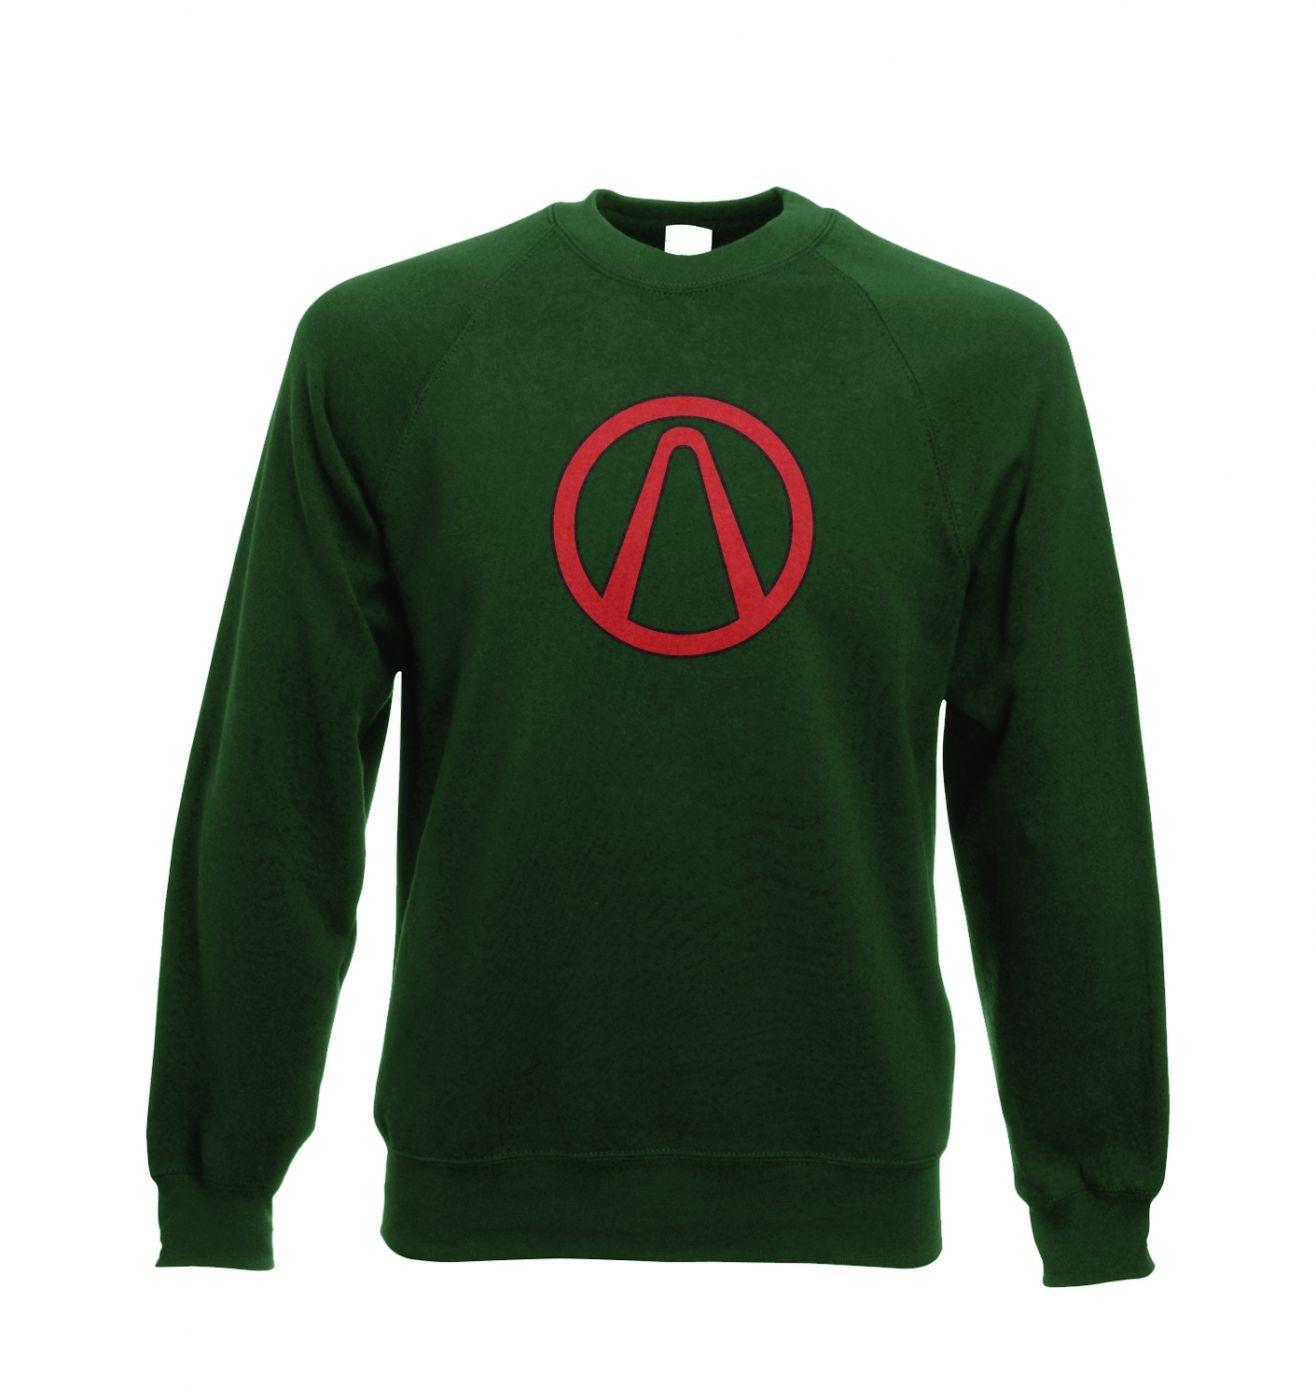 Vault Symbol crewneck sweatshirt